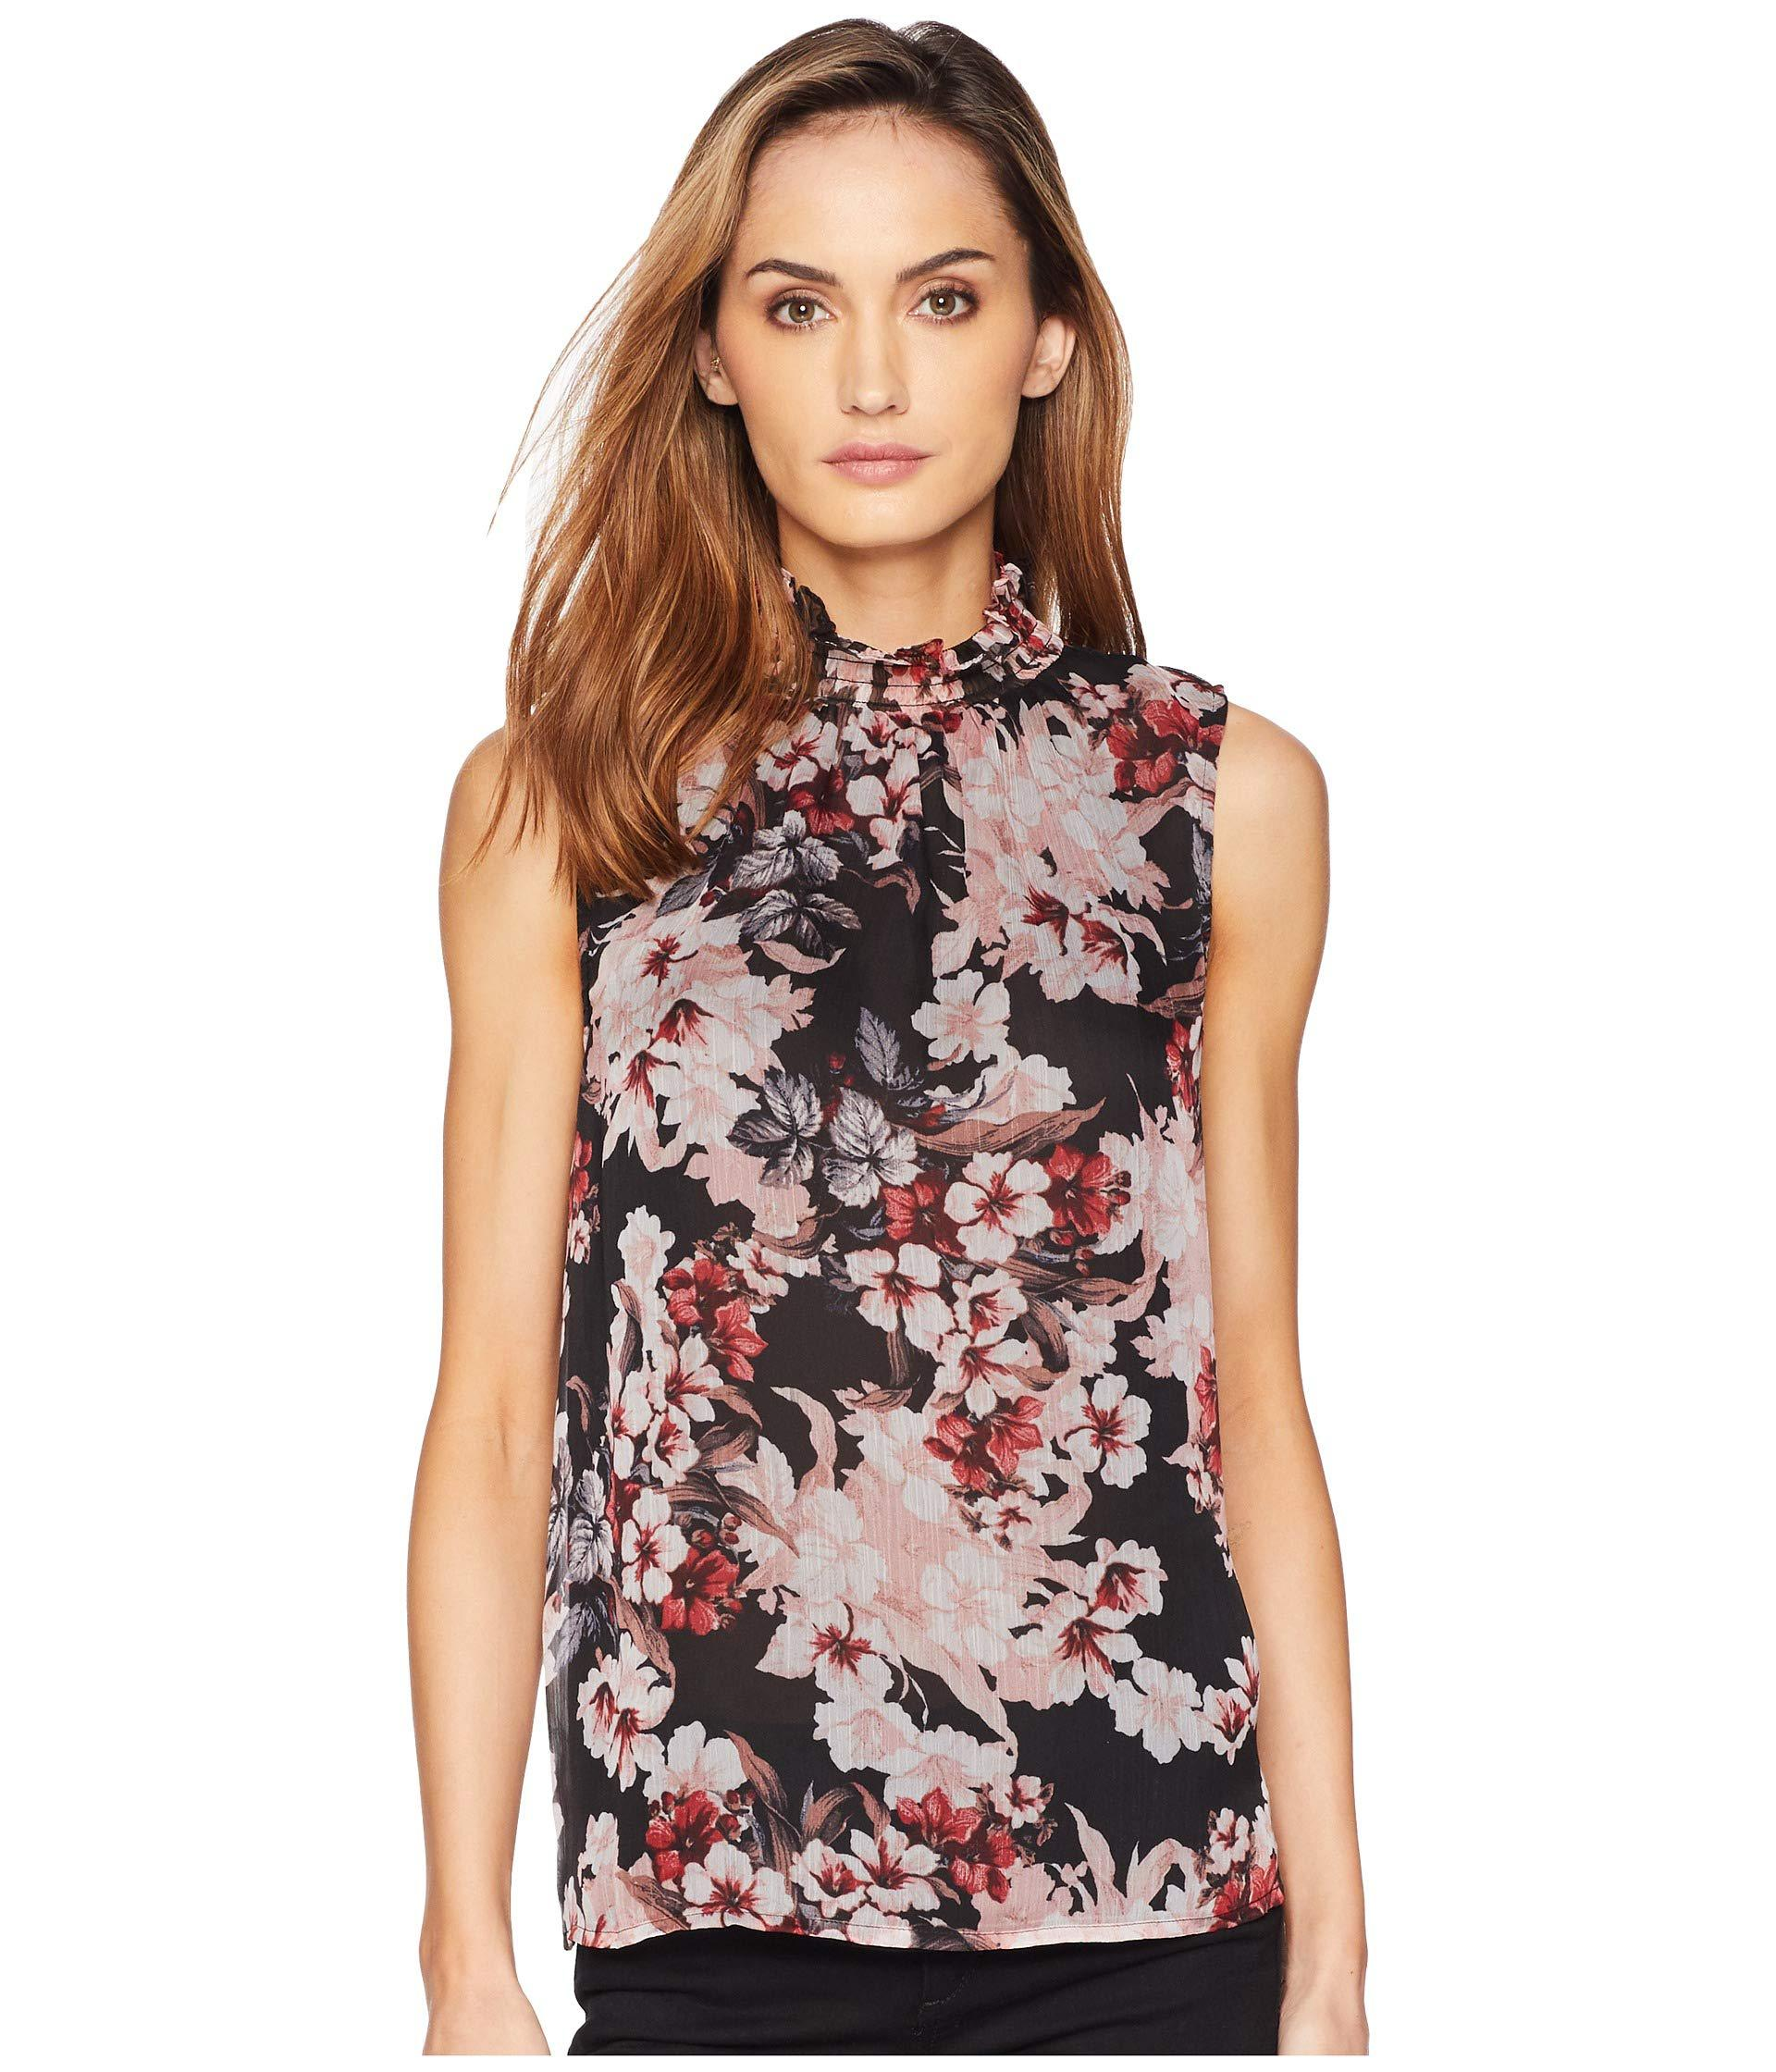 41212b83f3ba06 Vince Camuto. Women's Black Sleeveless Blooms Ruffle Smocked Neck Blouse